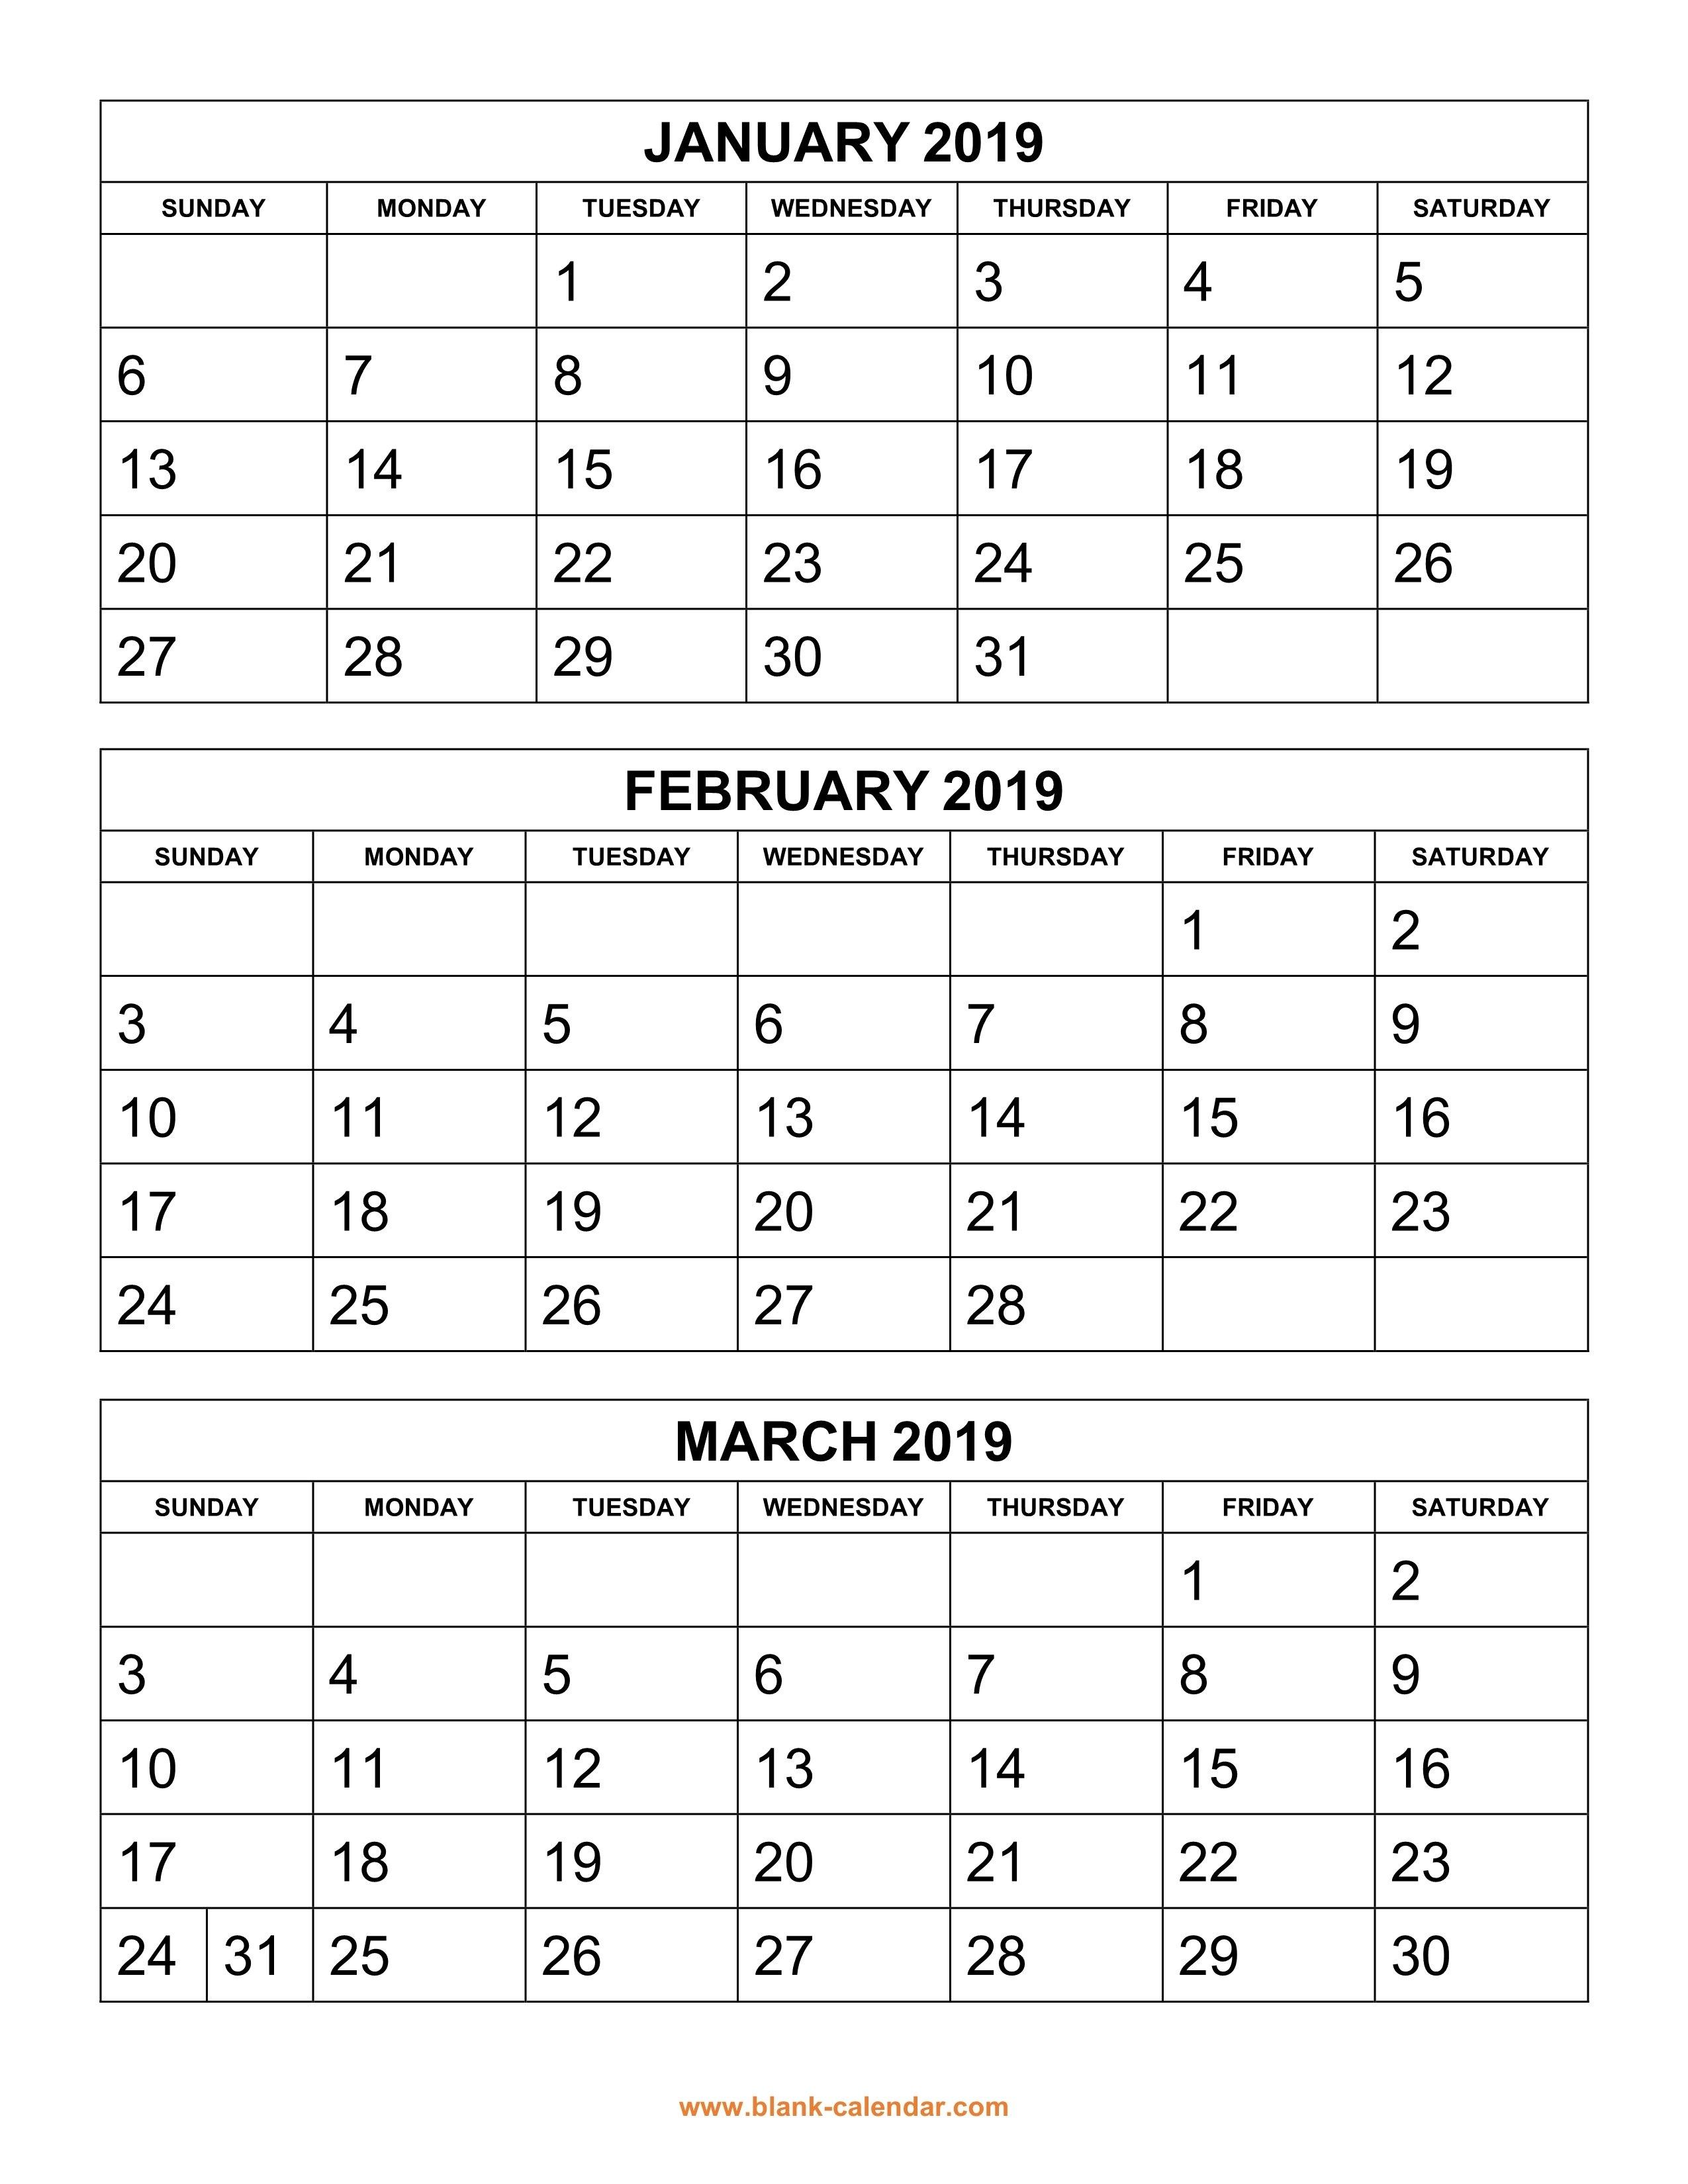 Free Download Printable Calendar 2019, 3 Months Per Page, 4 Pages 2019 Calendar 4 Months Per Page